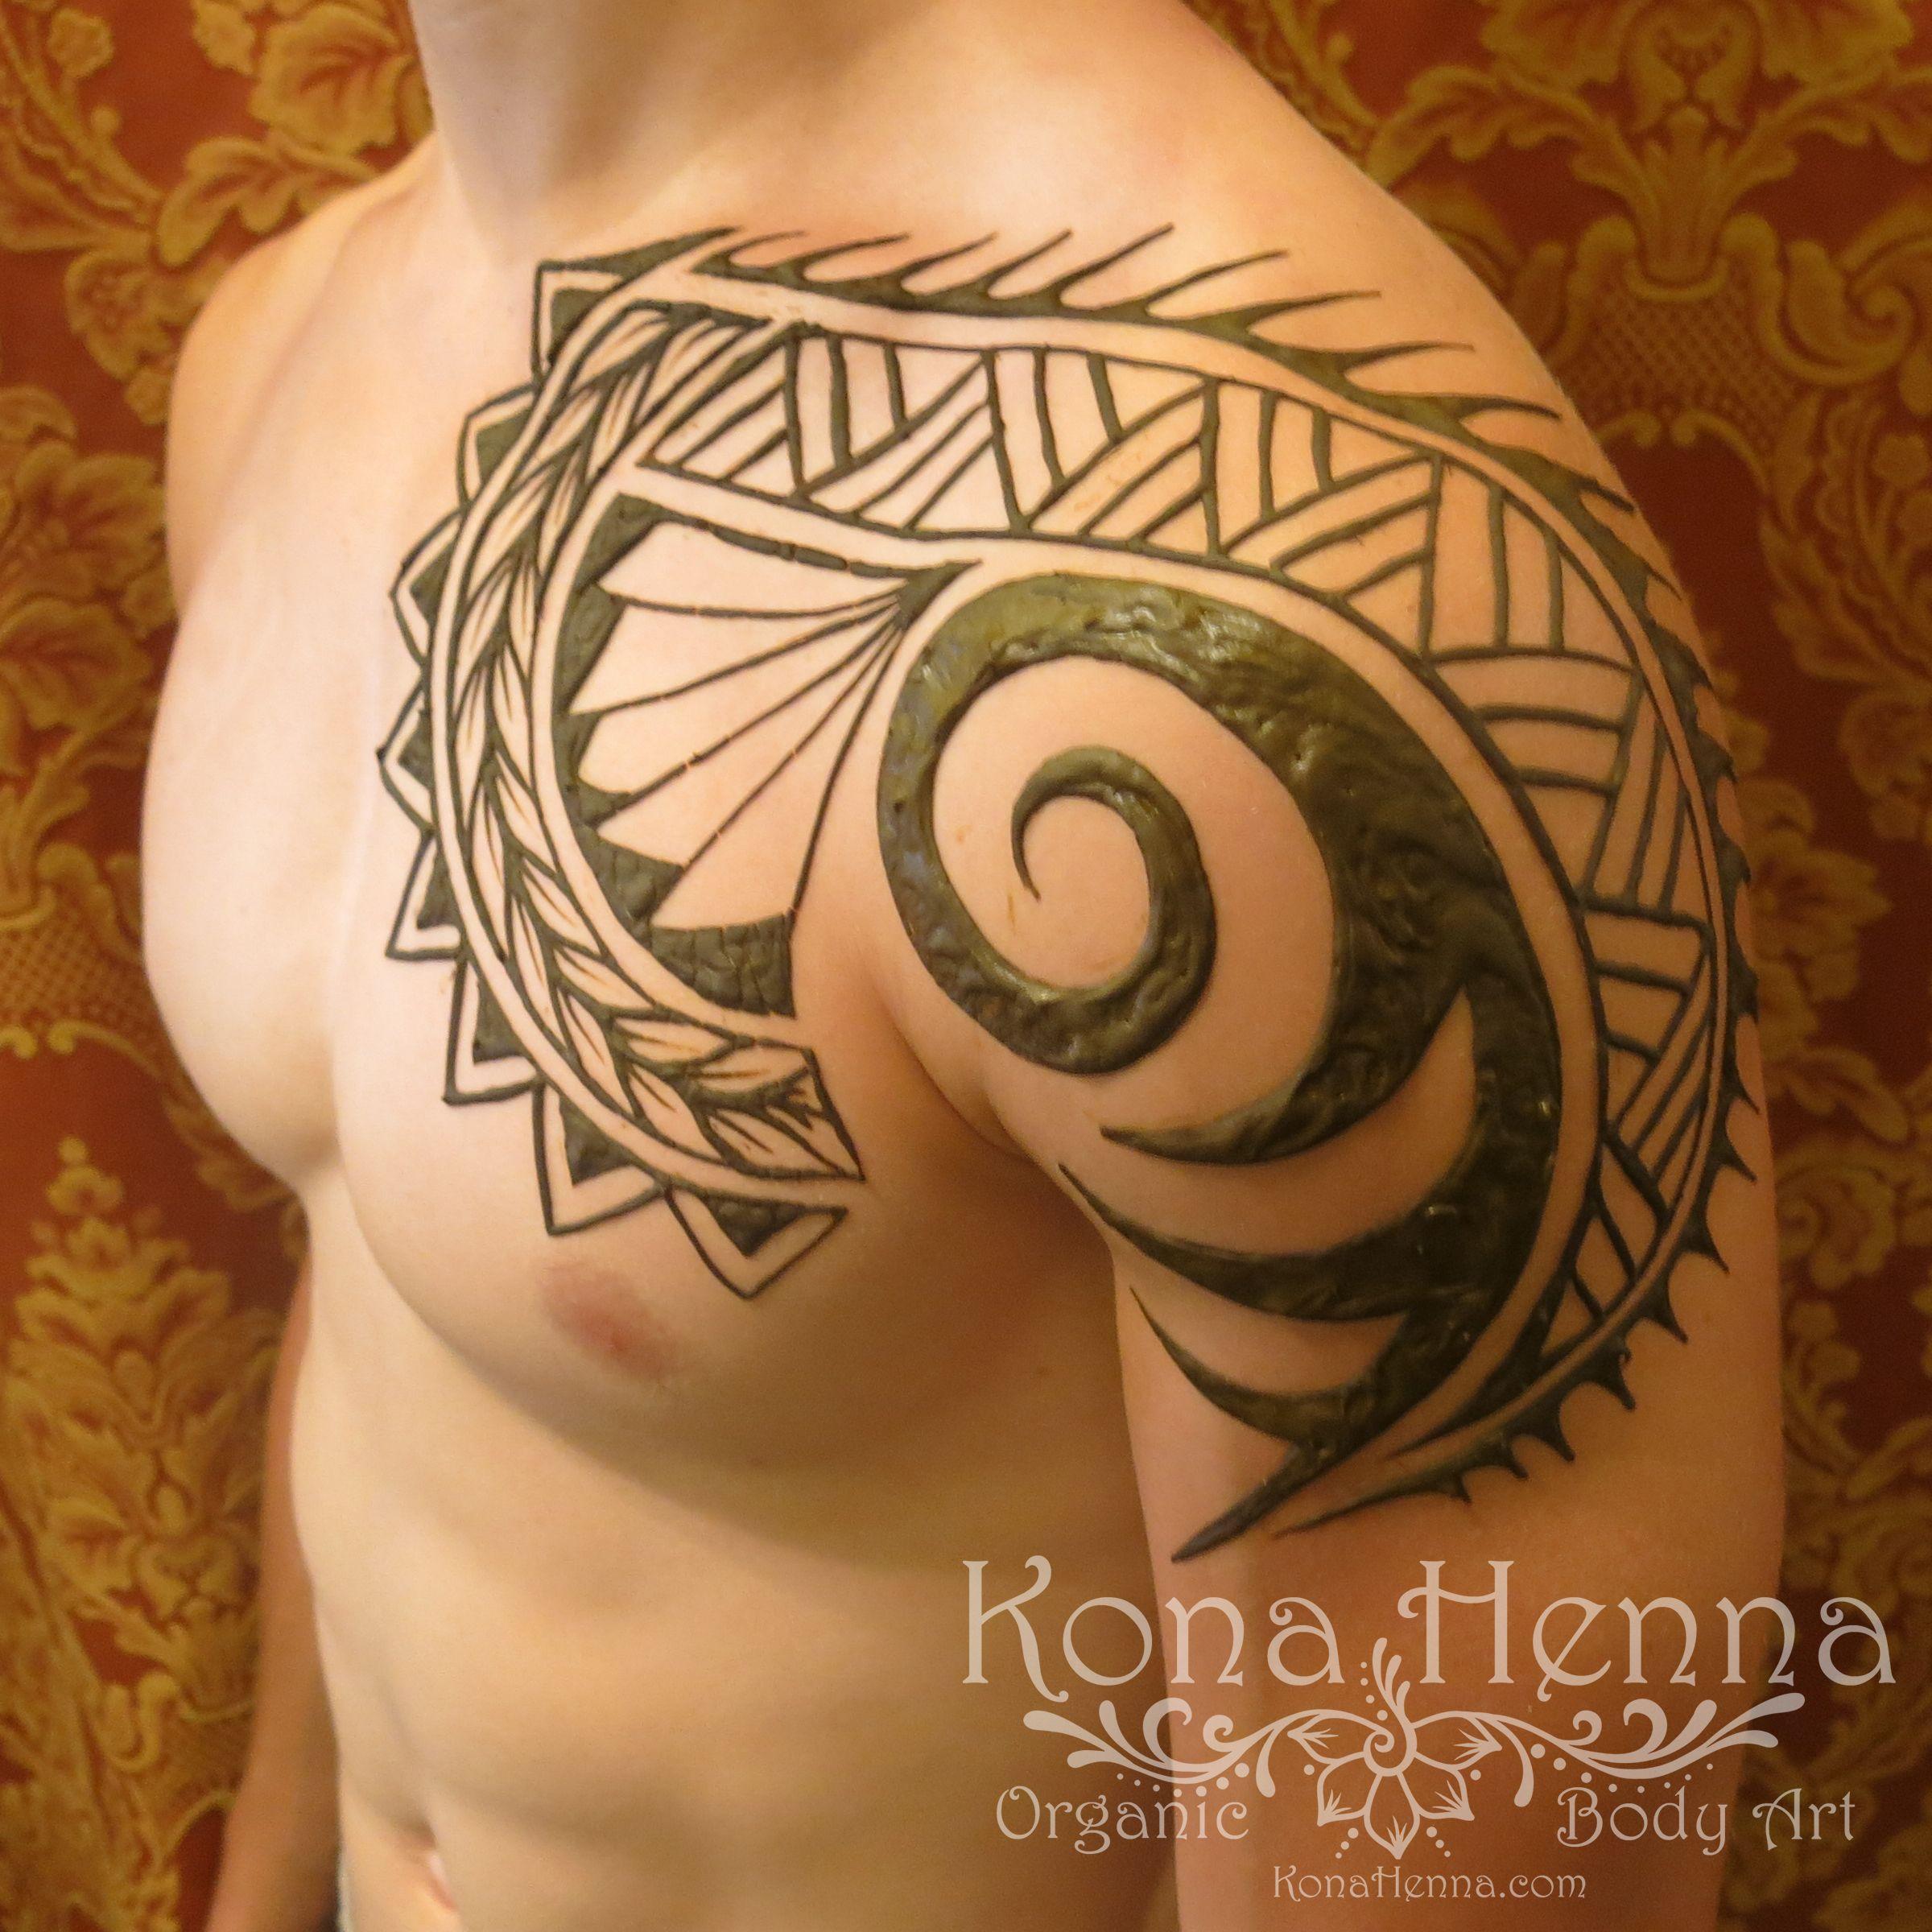 Organic Henna Products Professional Henna Studio Konahennacom